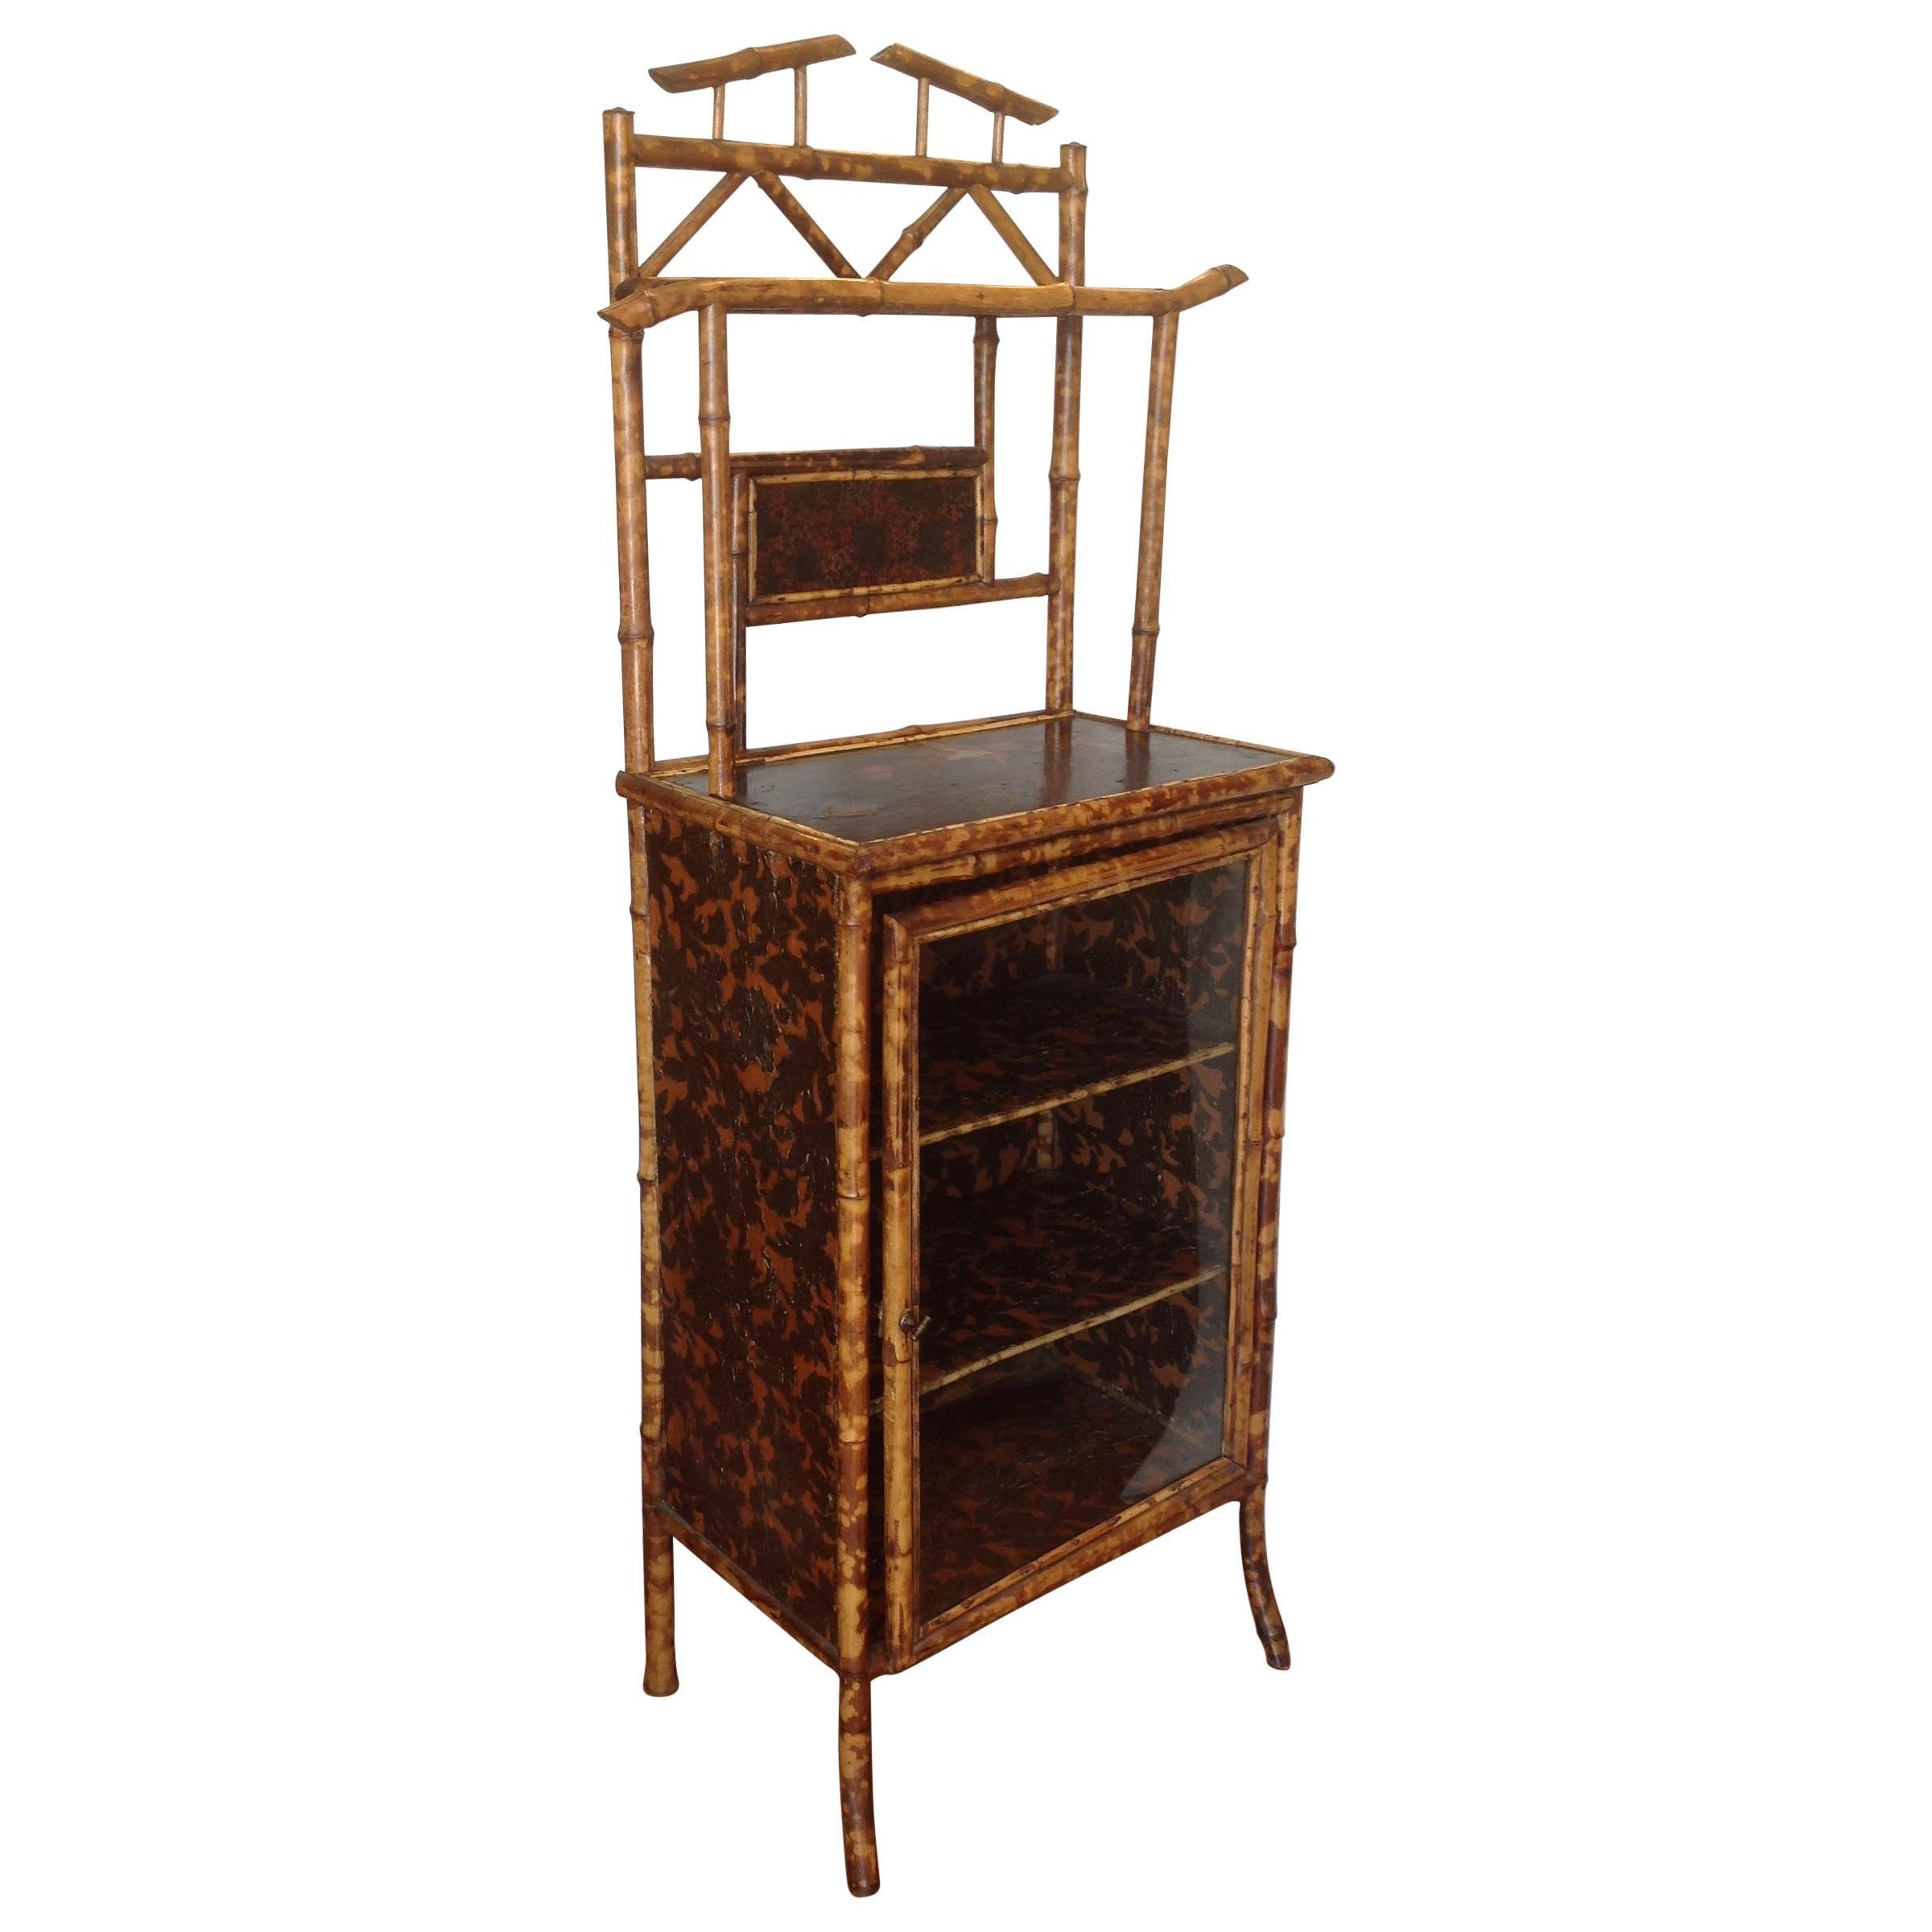 19th Century English Bamboo Bookcase / Cabinet